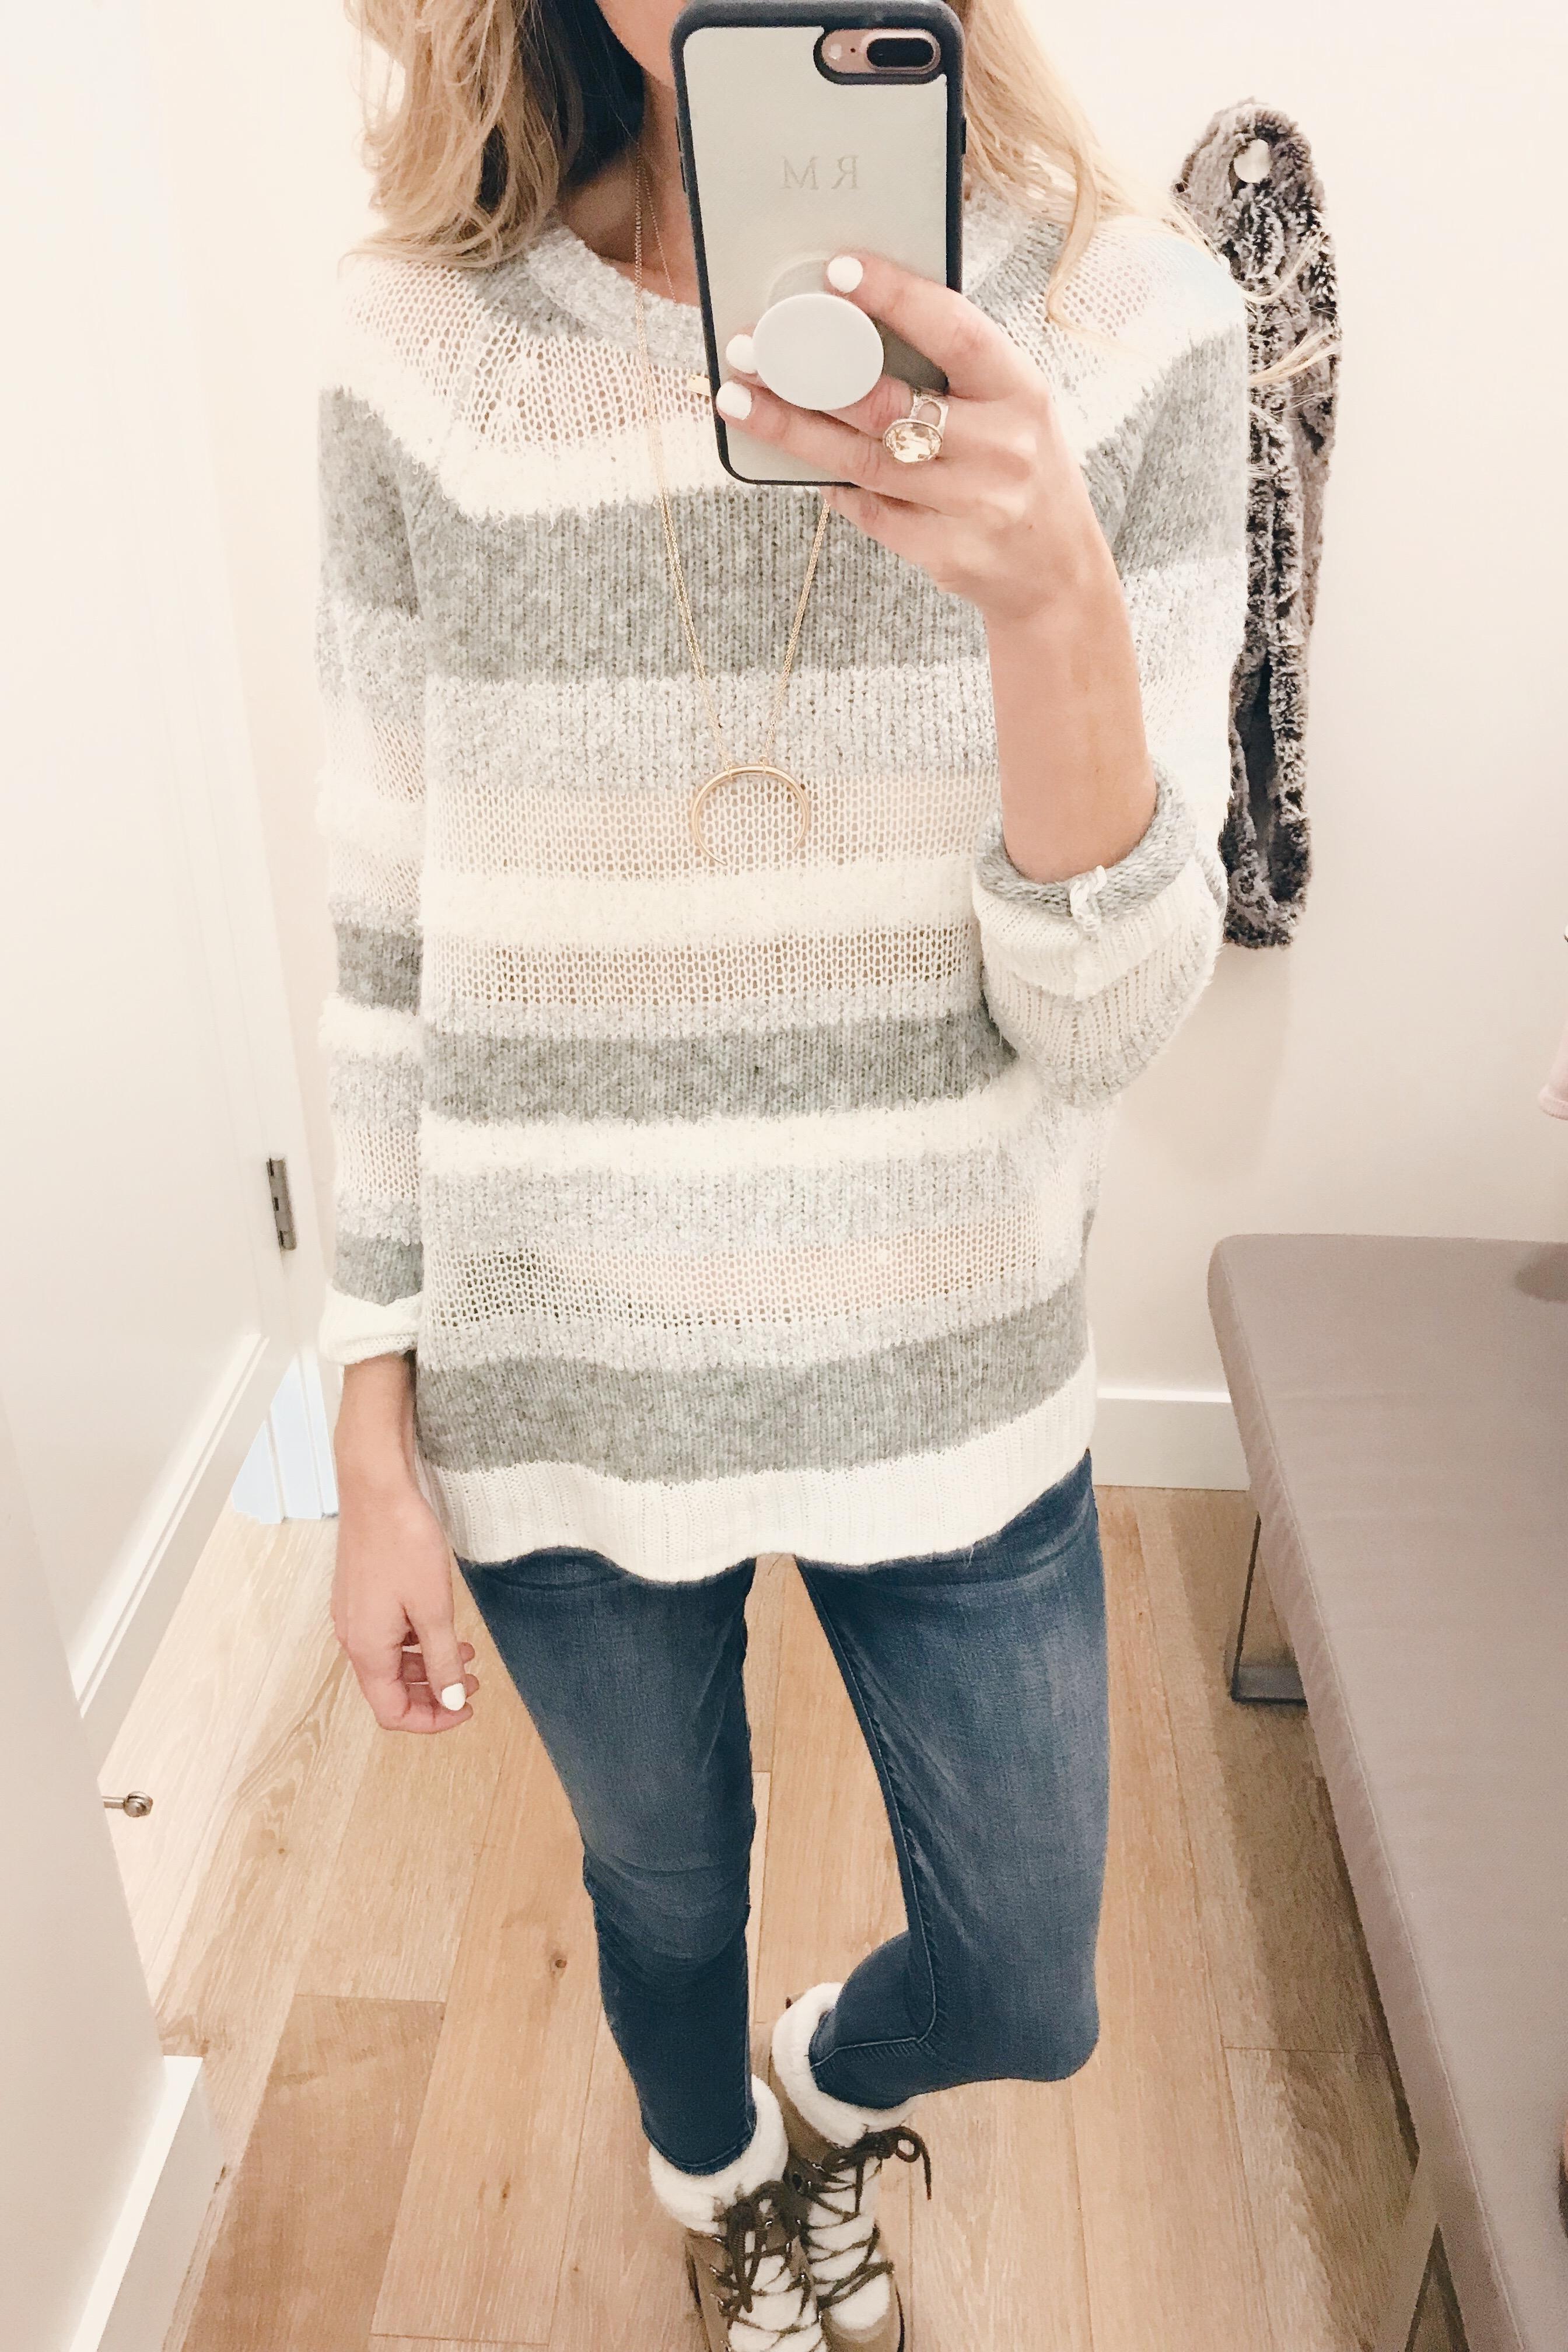 veteran's day weekend sale round up 2018 striped neutral sweater